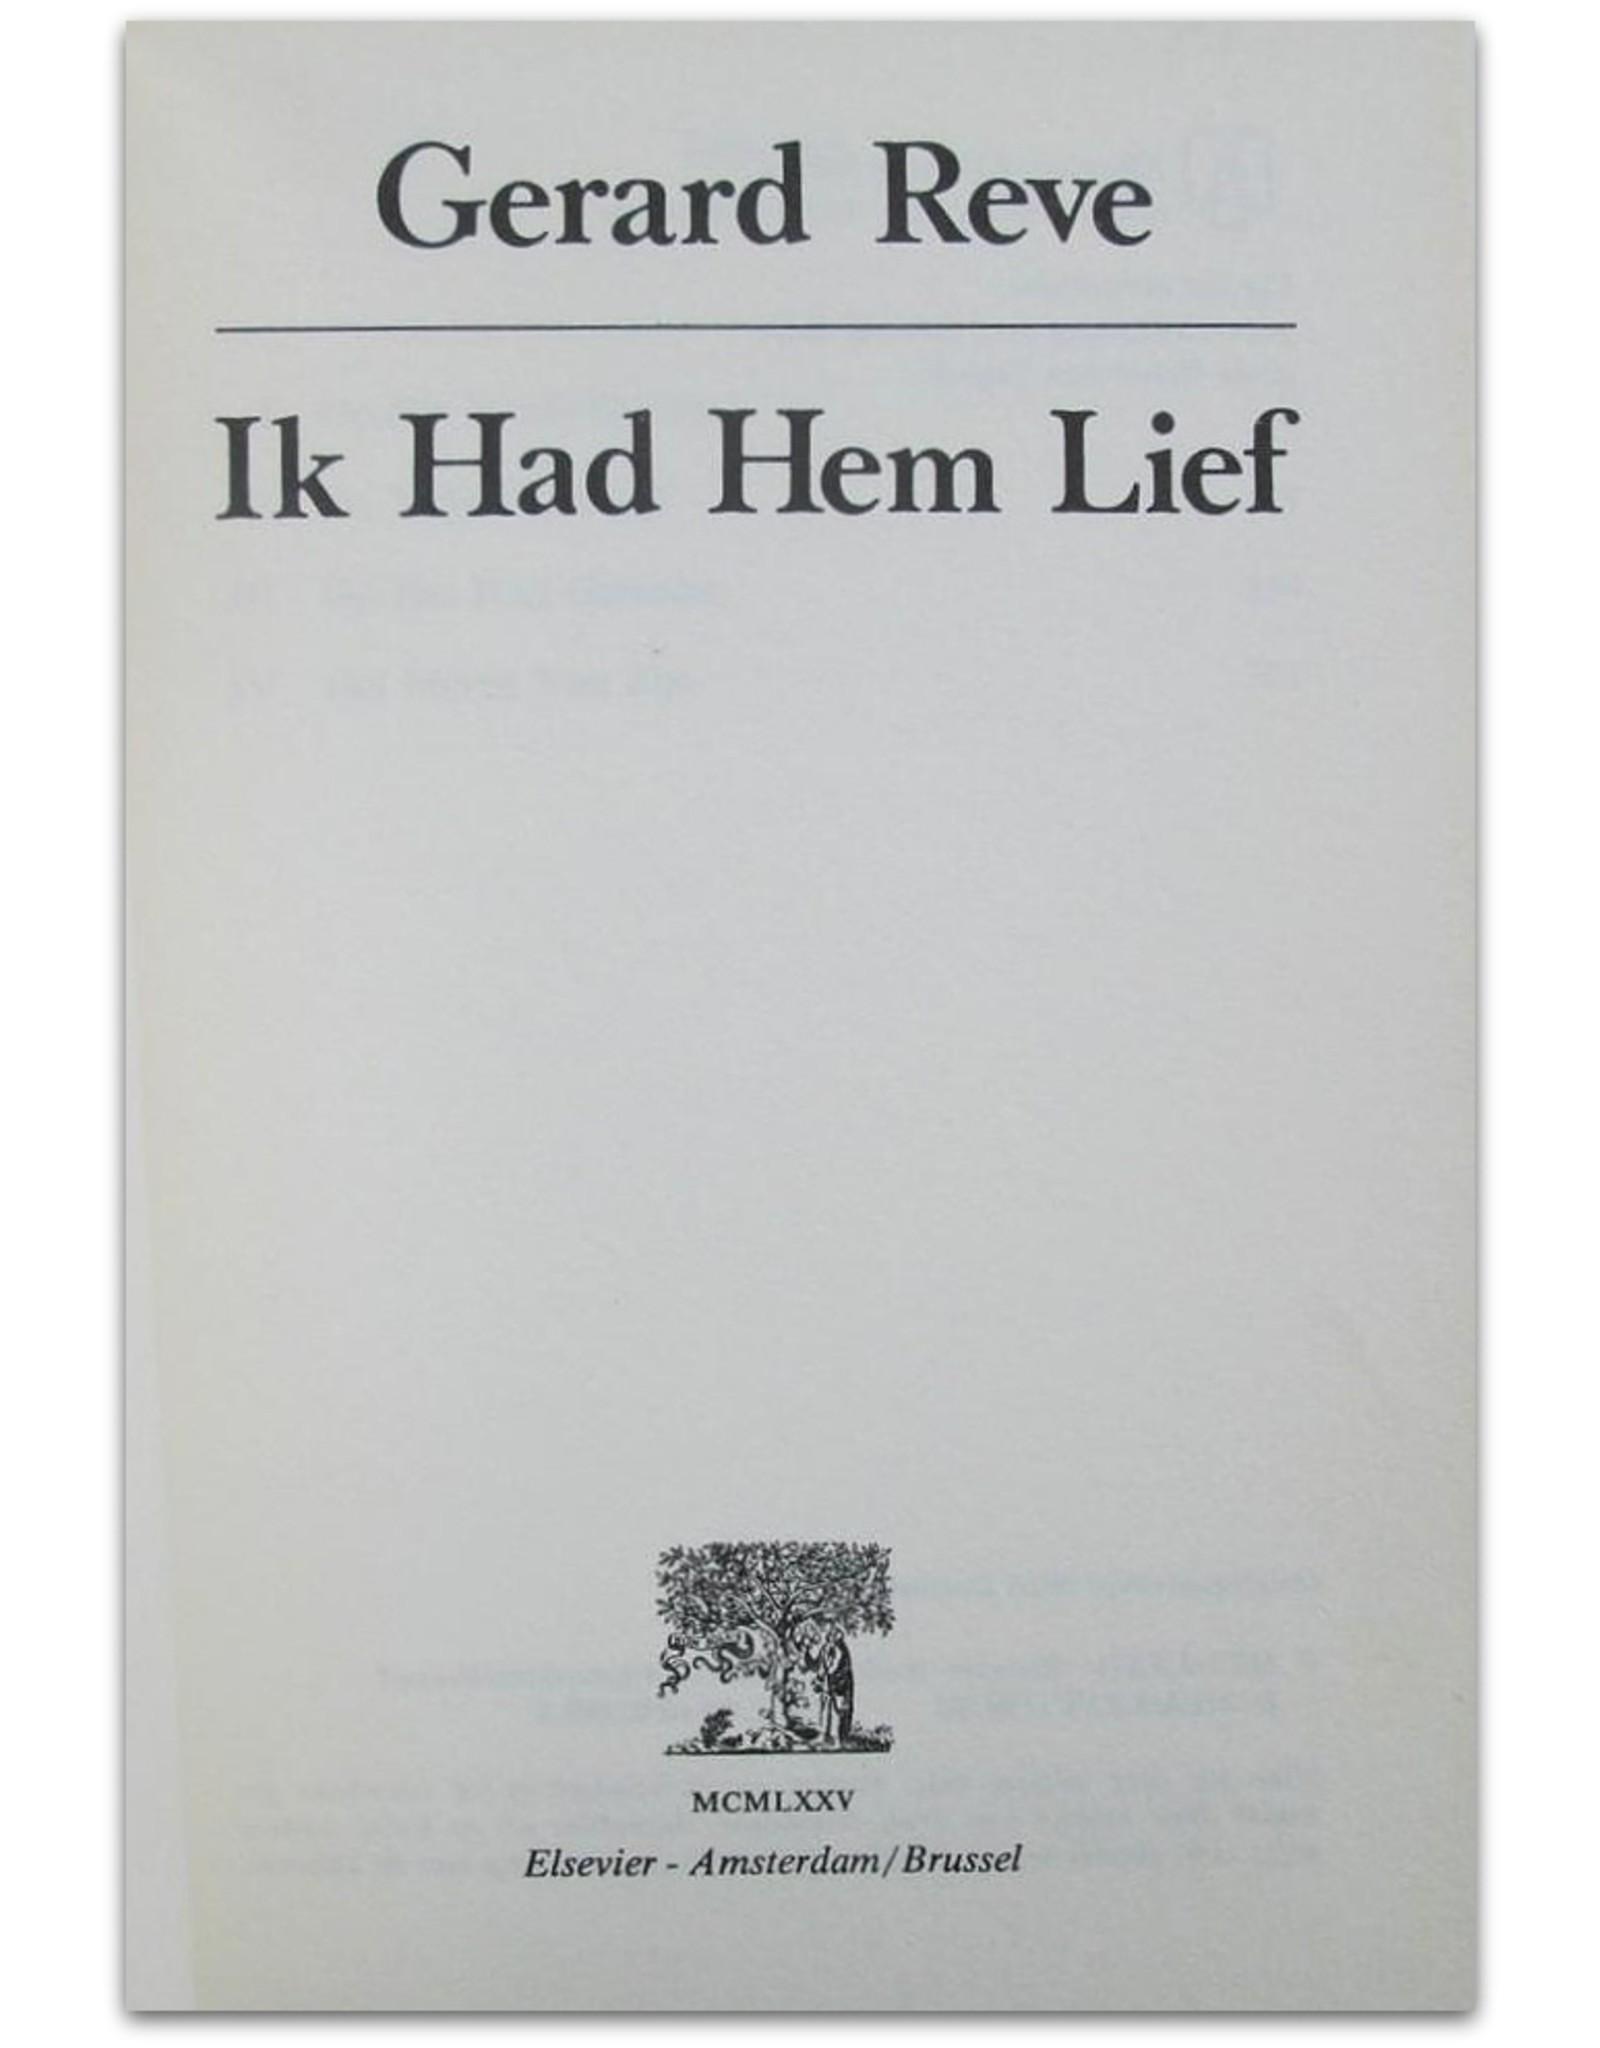 Gerard Reve - Ik had hem lief